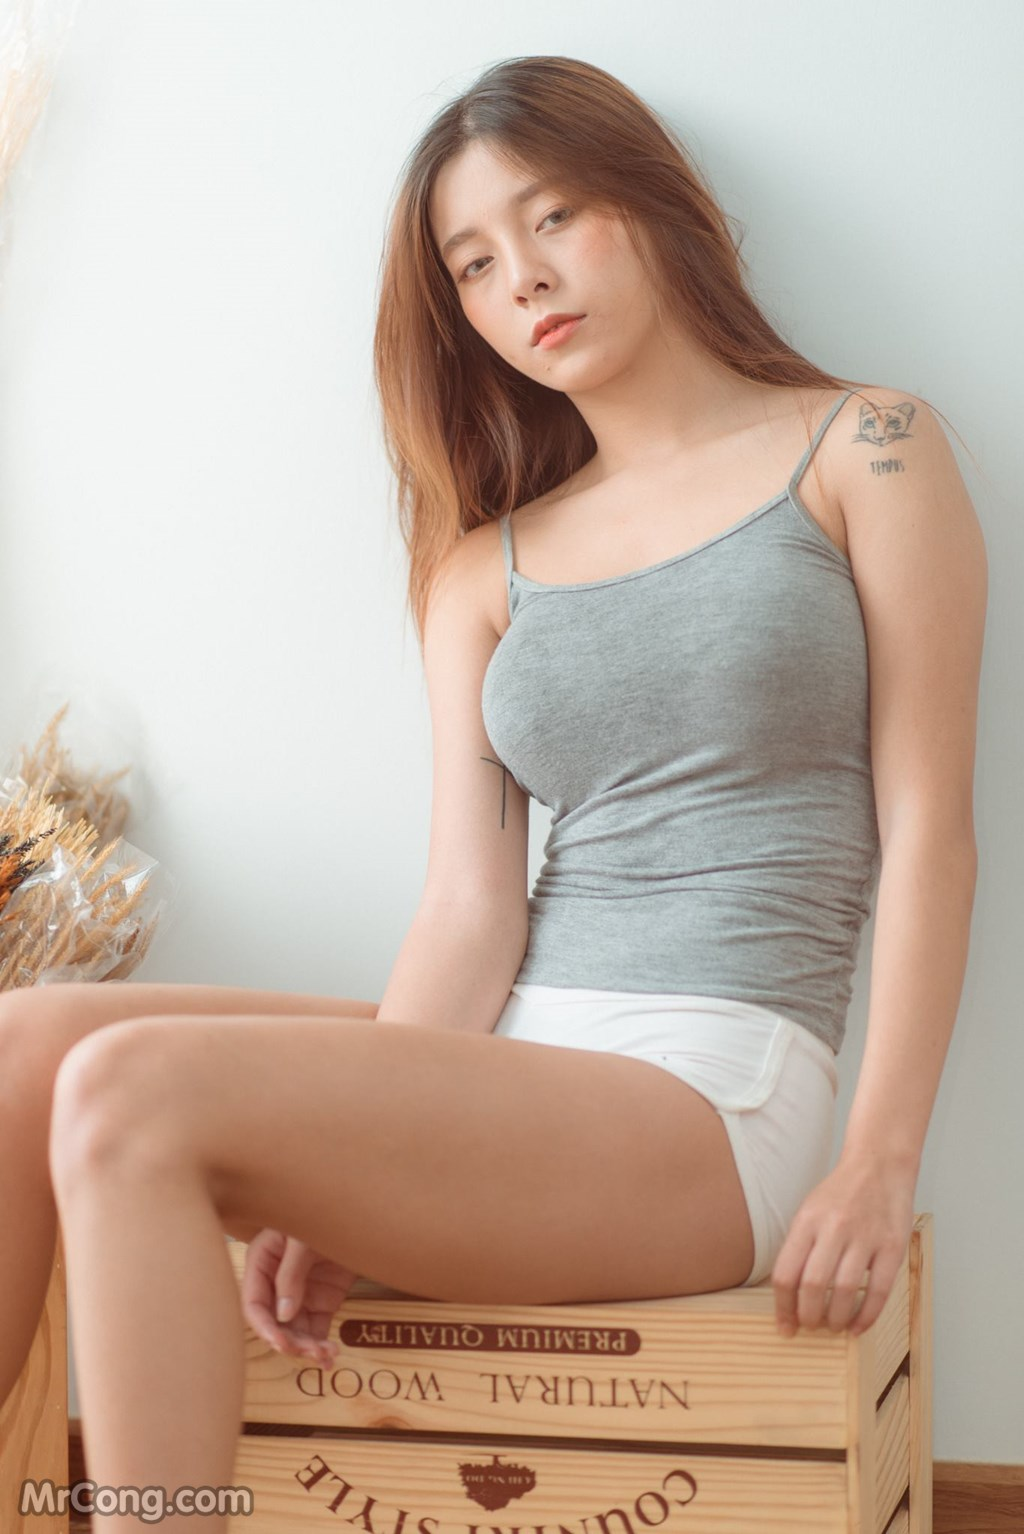 Image Thai-Model-Suchada-Pramoulkan-MrCong.com-009 in post Bộ ảnh nội y đầy mê hoặc của người đẹp Suchada Pramoulkan (39 ảnh)